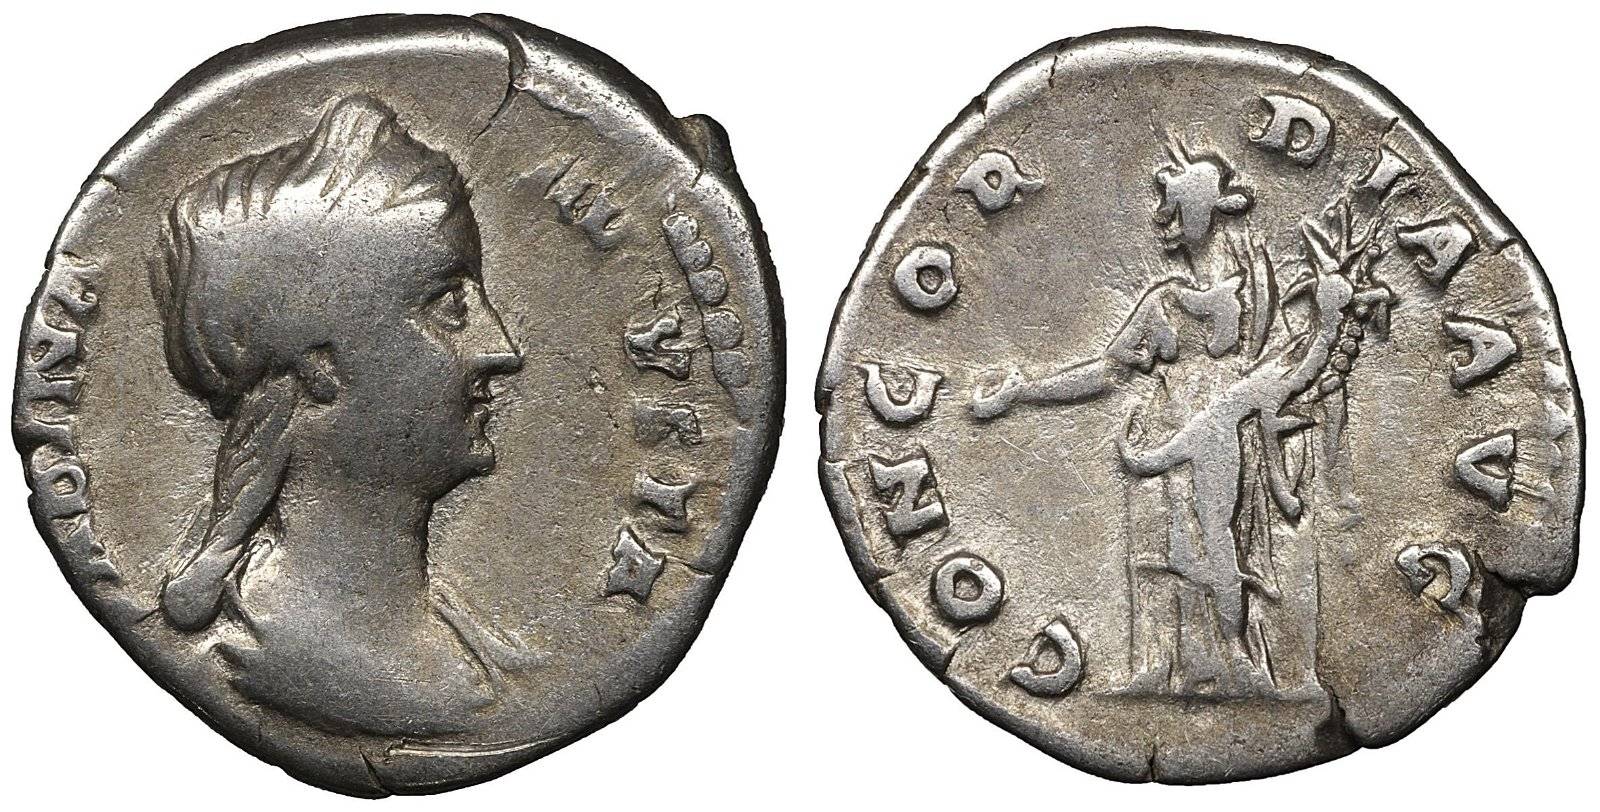 SABINA wife of Hadrian Silver Denarius Struck 128 AD